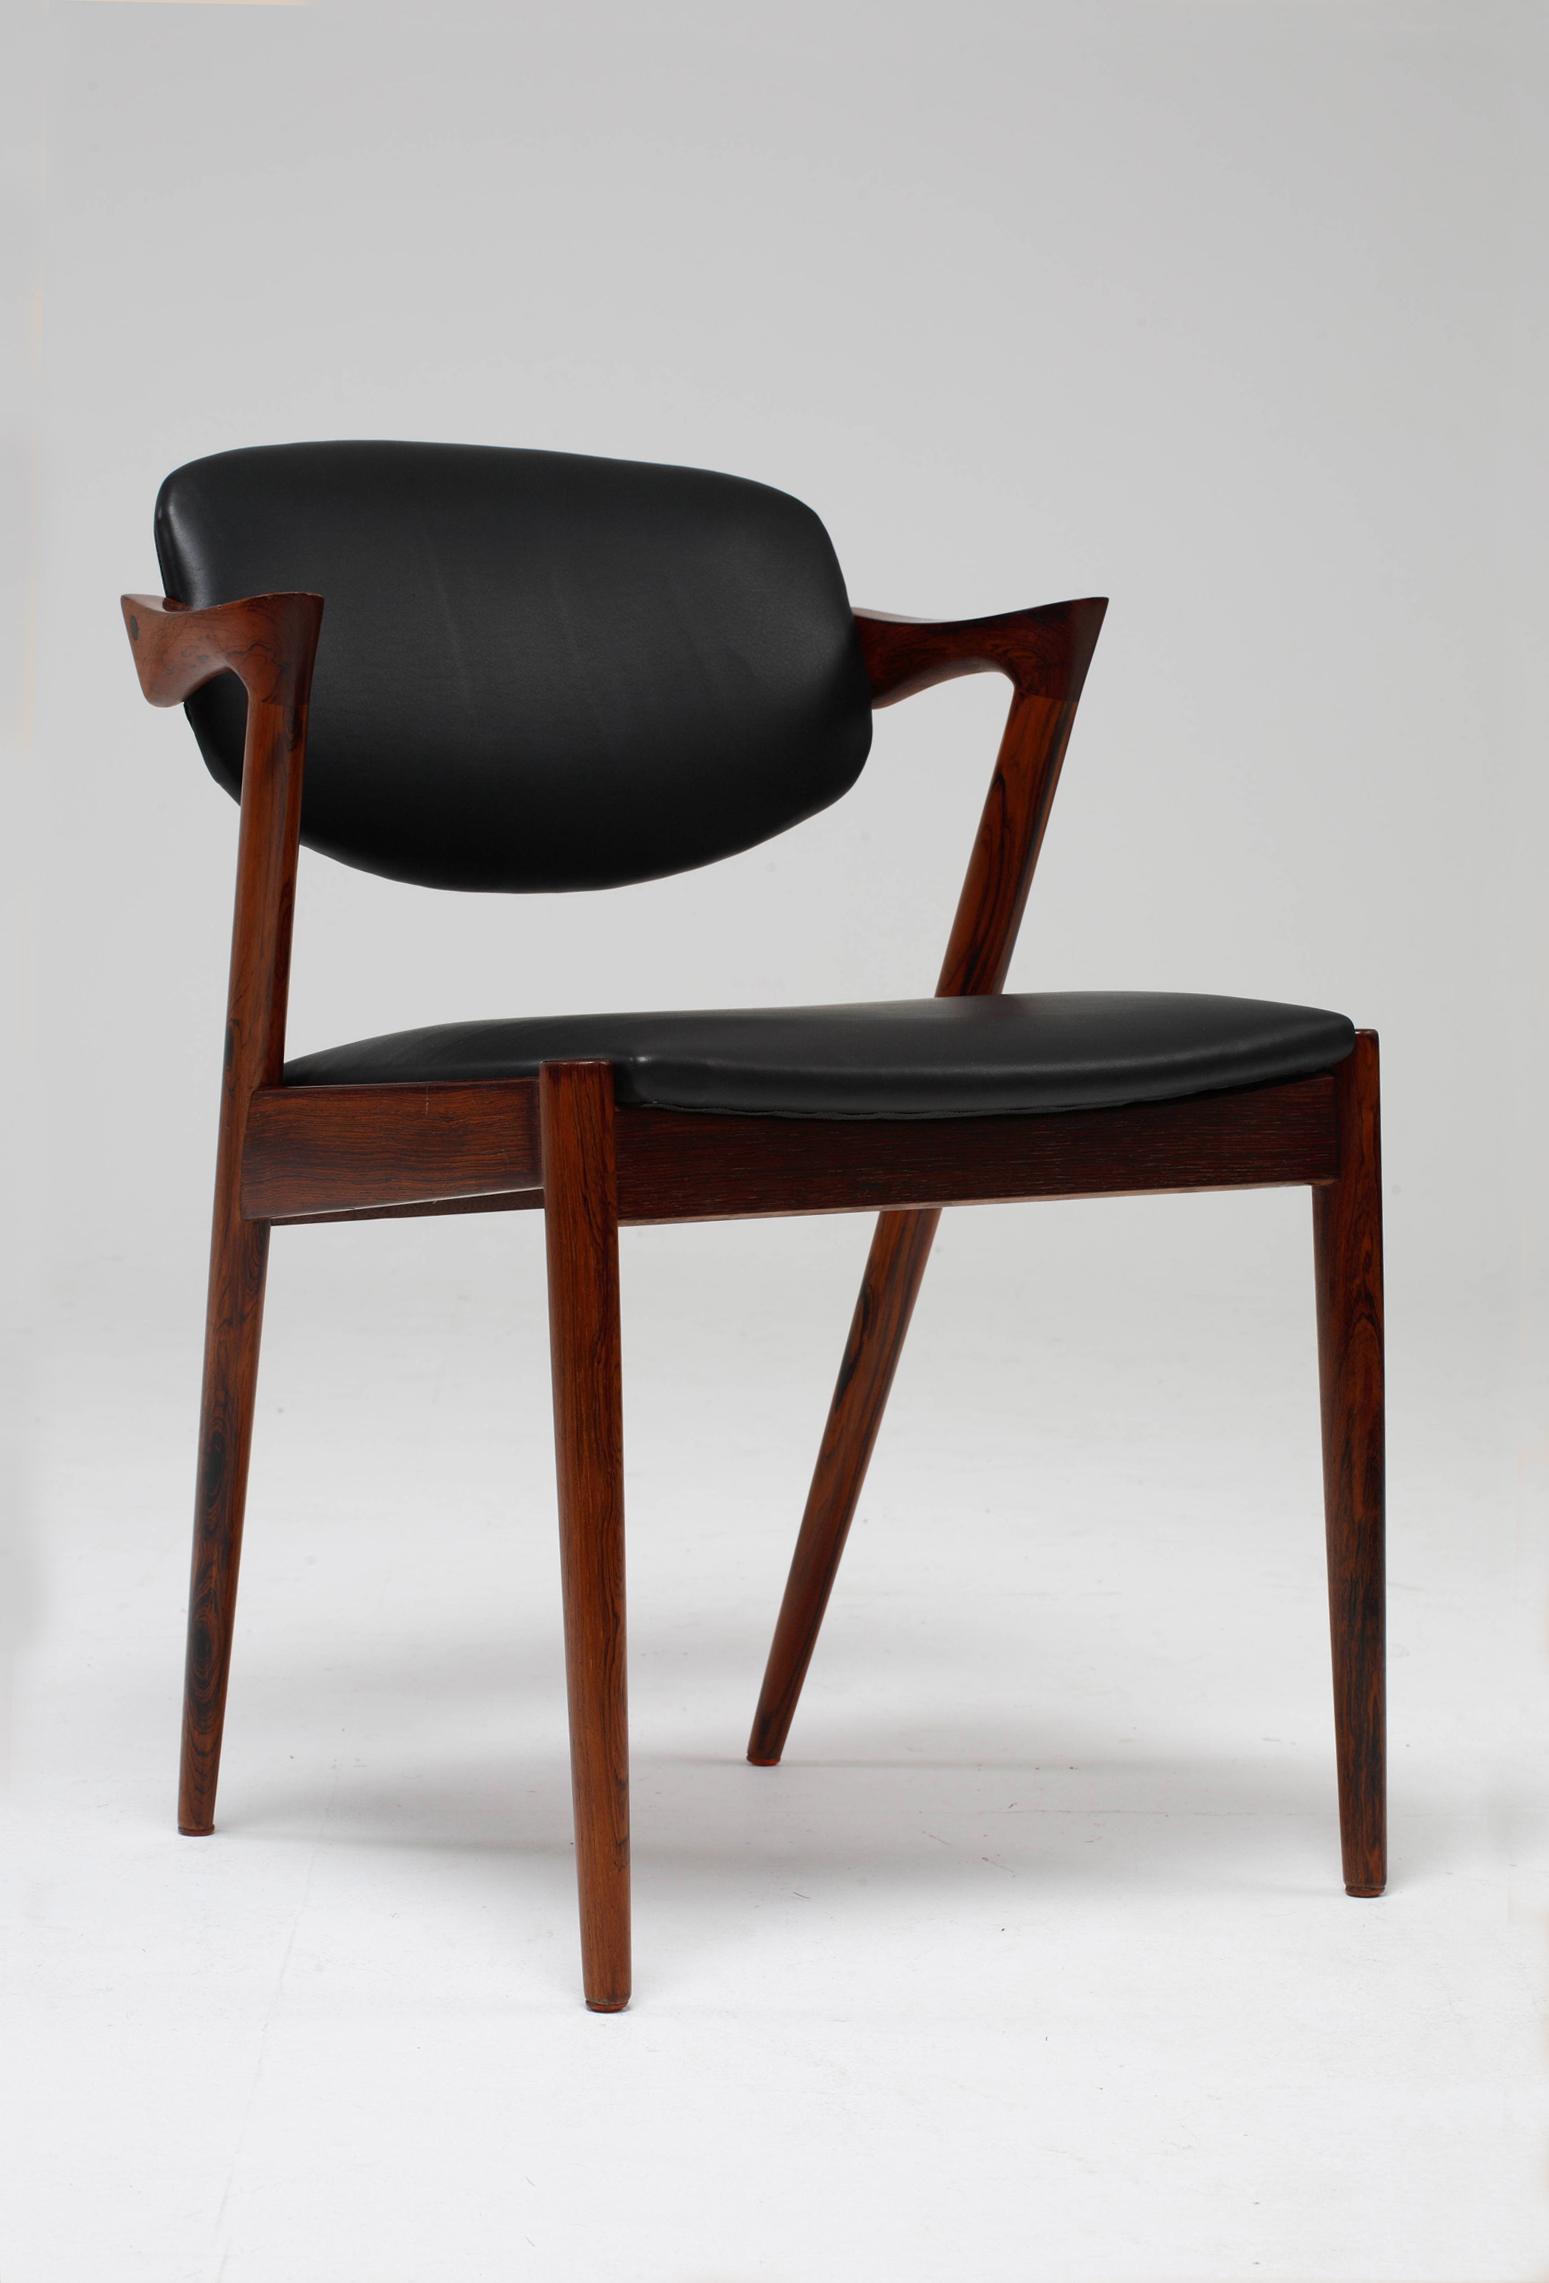 Chair_10_002_resize_cleaned.jpg